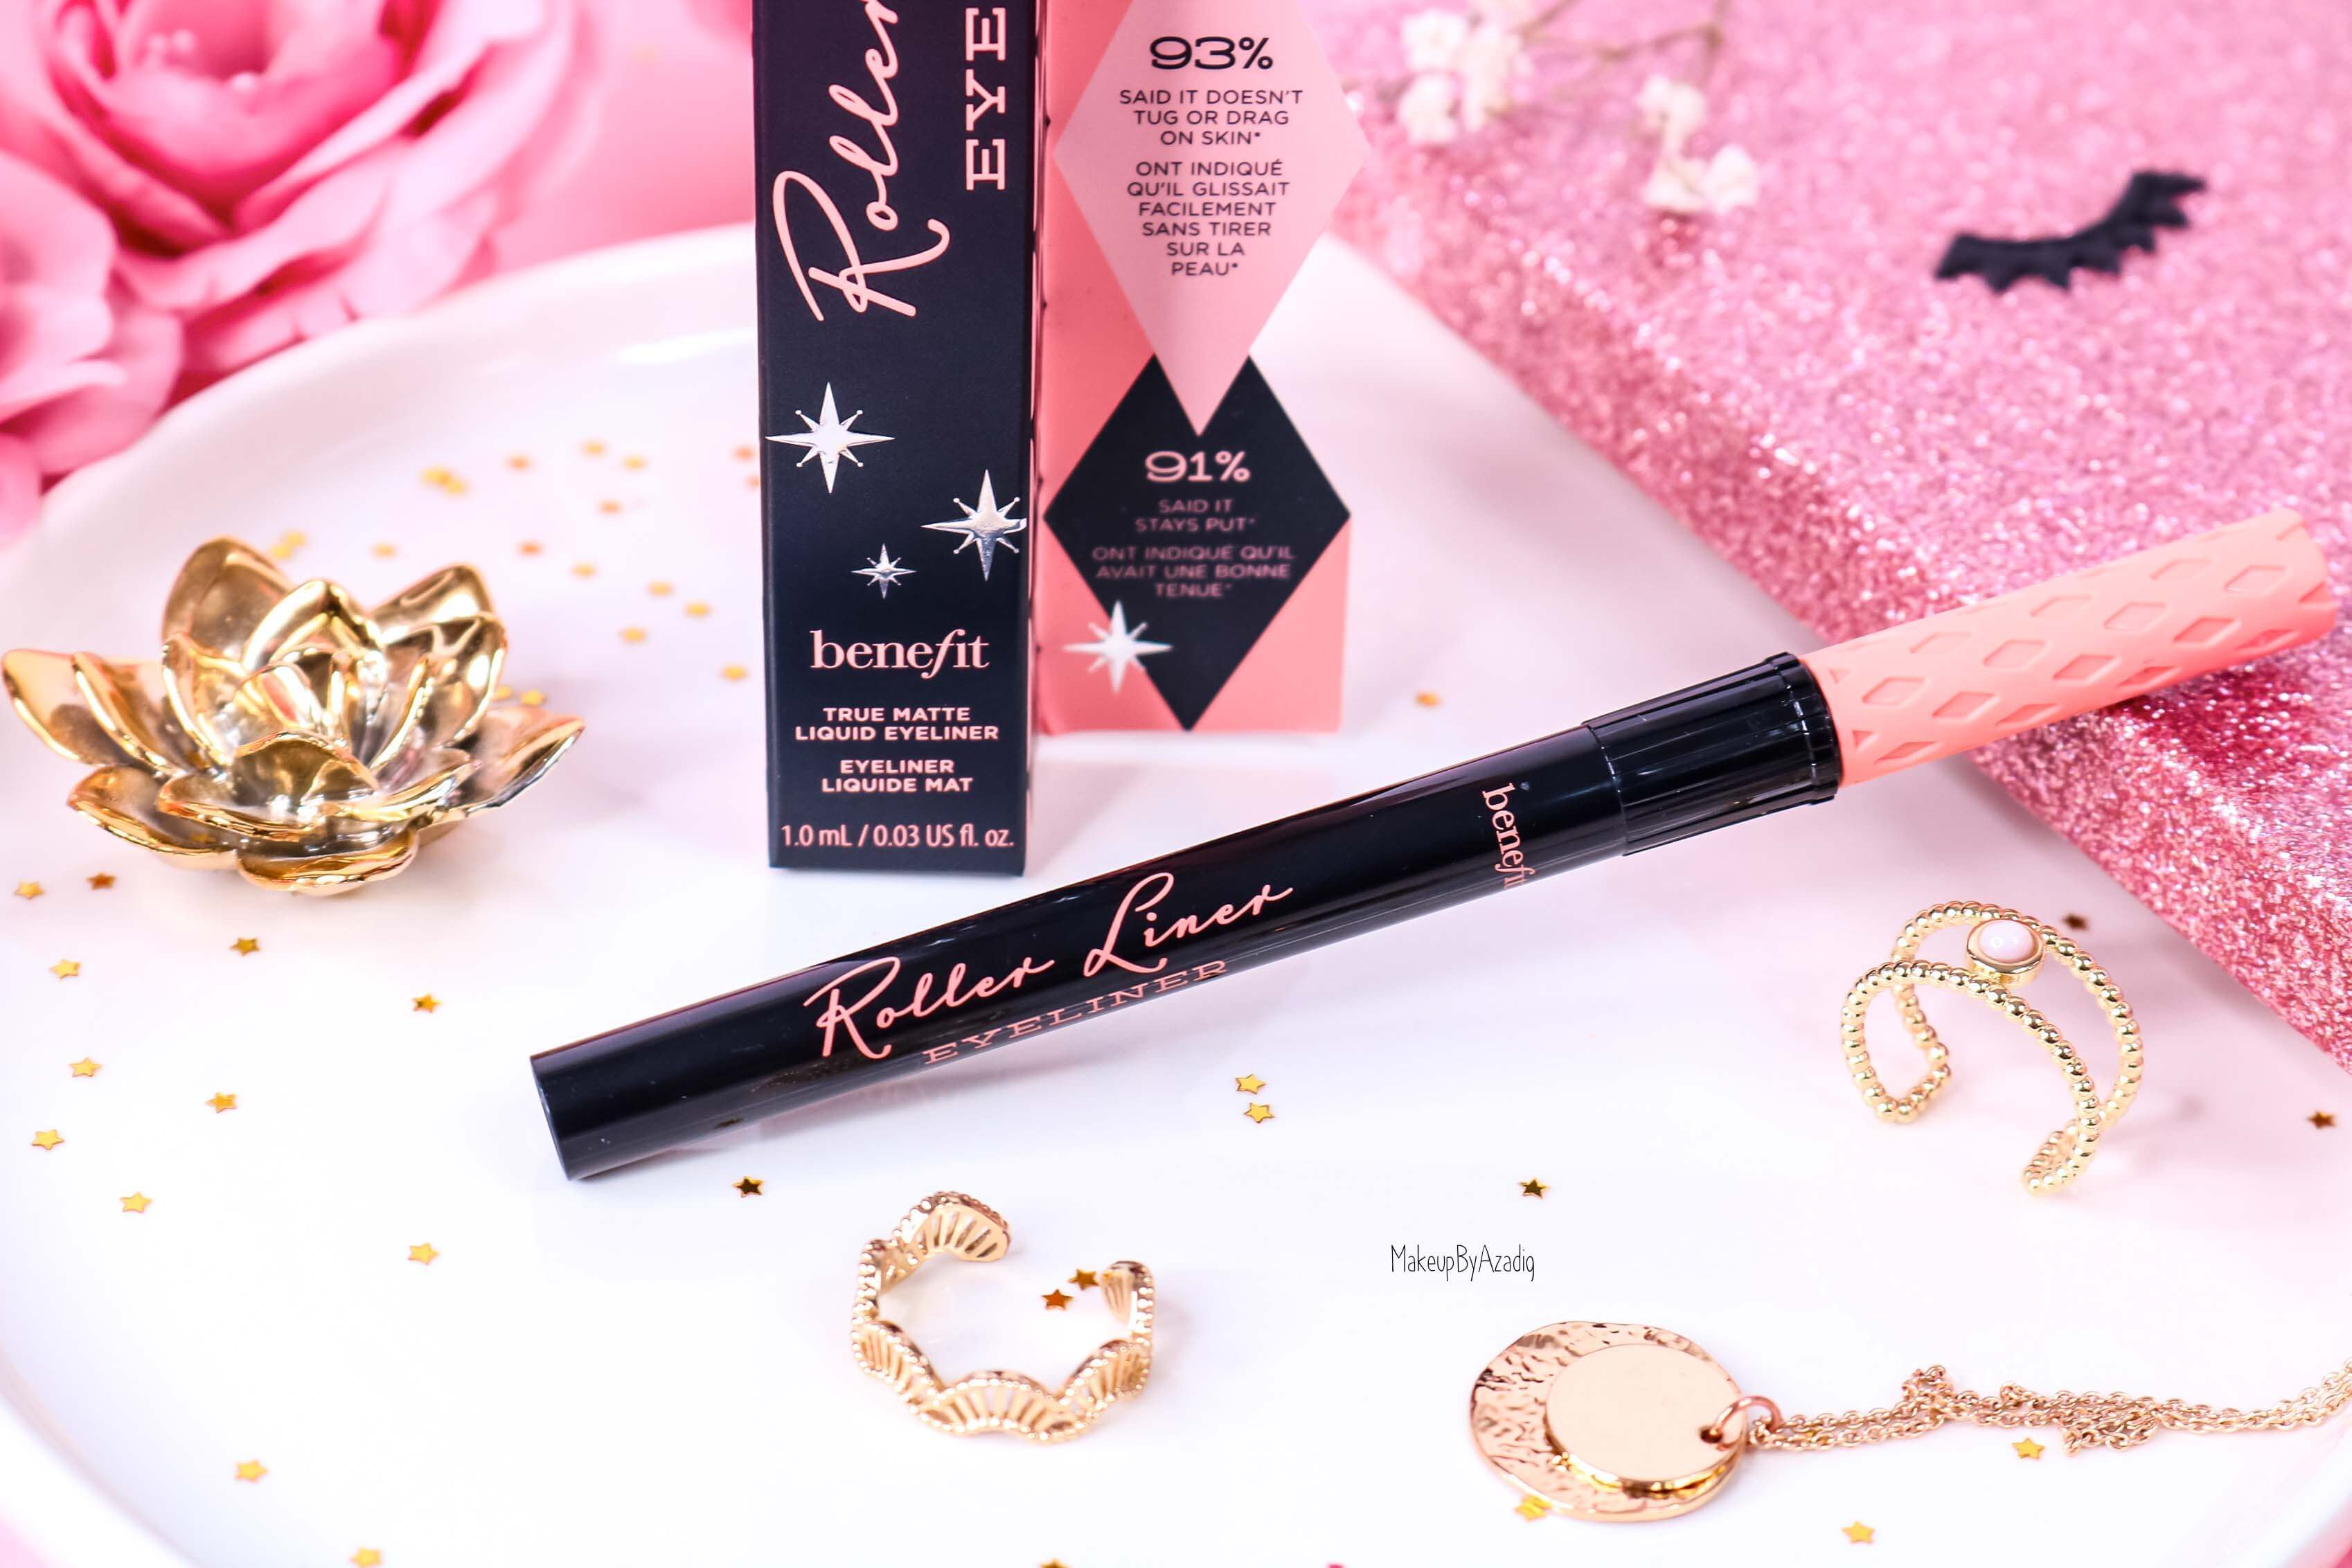 revue-review-eyeliner-roller-liner-benefit-noir-mat-makeupbyazadig-avis-prix-swatch-sephora-france-indispensable